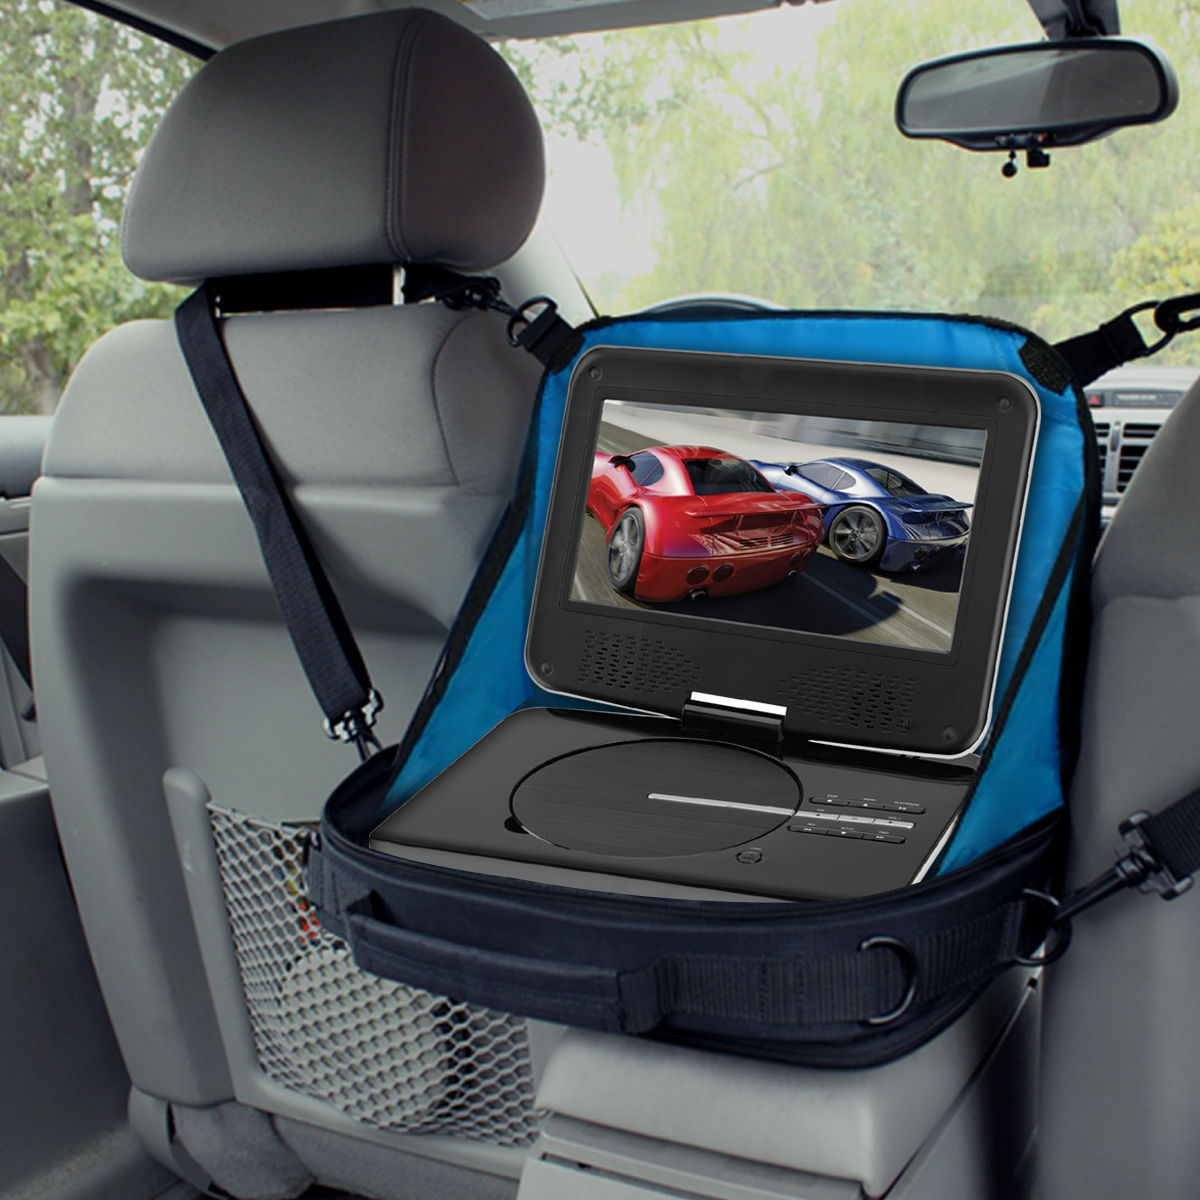 portable dvd player case car headrest mount w pockets scratch free interior 637836579501 ebay. Black Bedroom Furniture Sets. Home Design Ideas